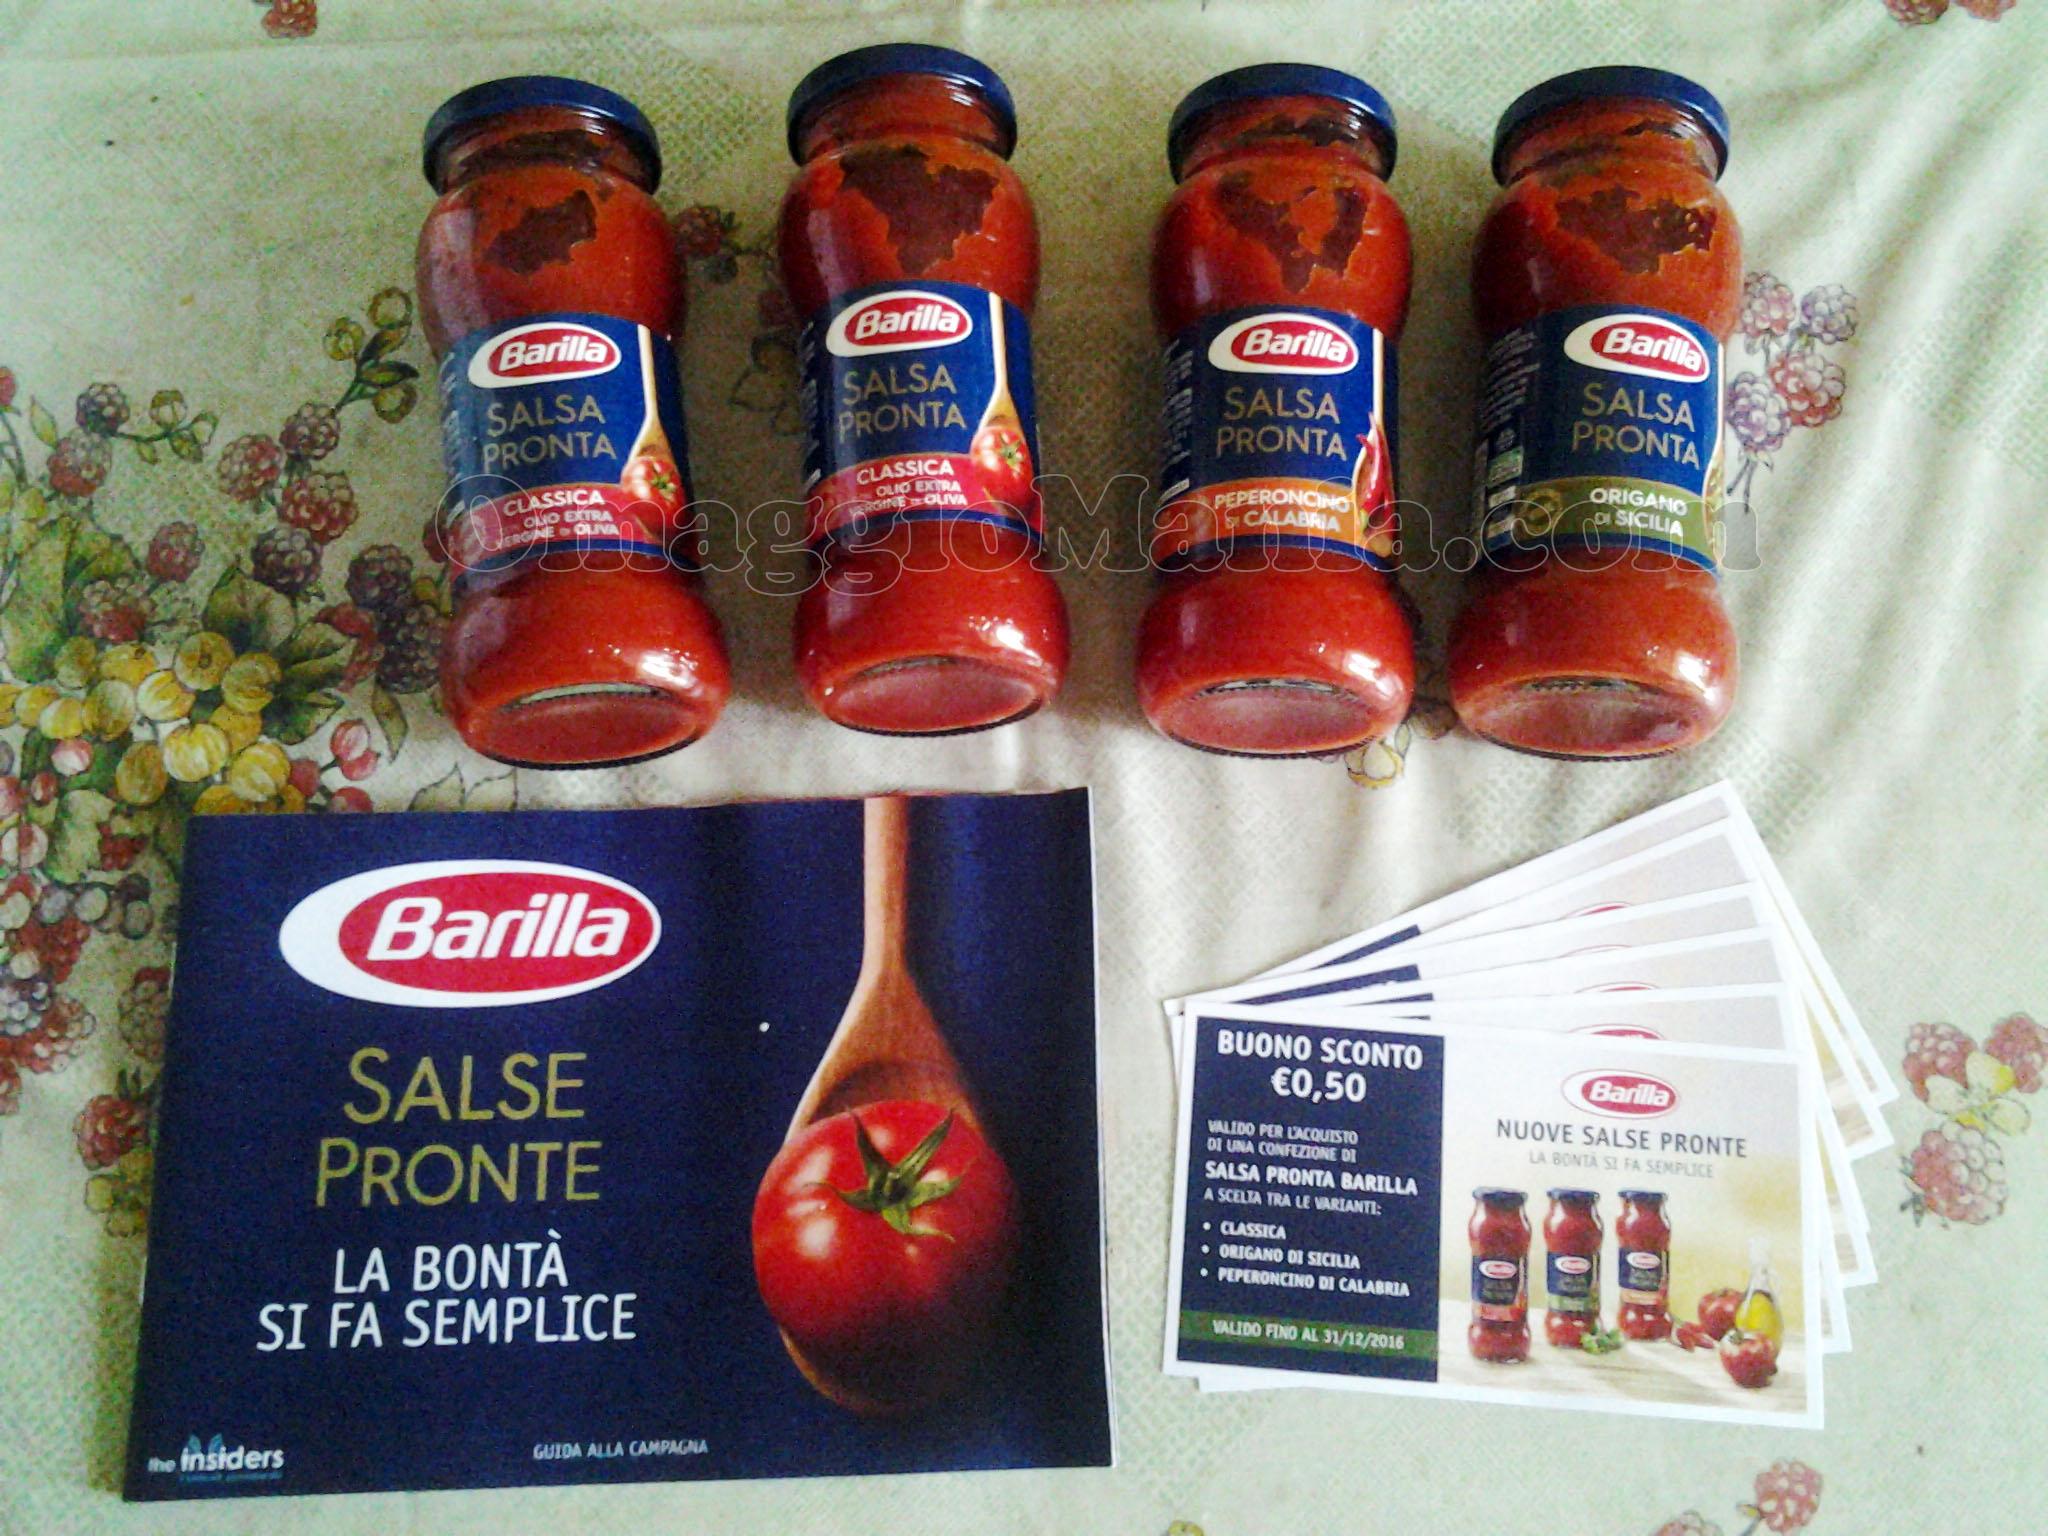 kit Barilla Salsa Pronta di Tizzi